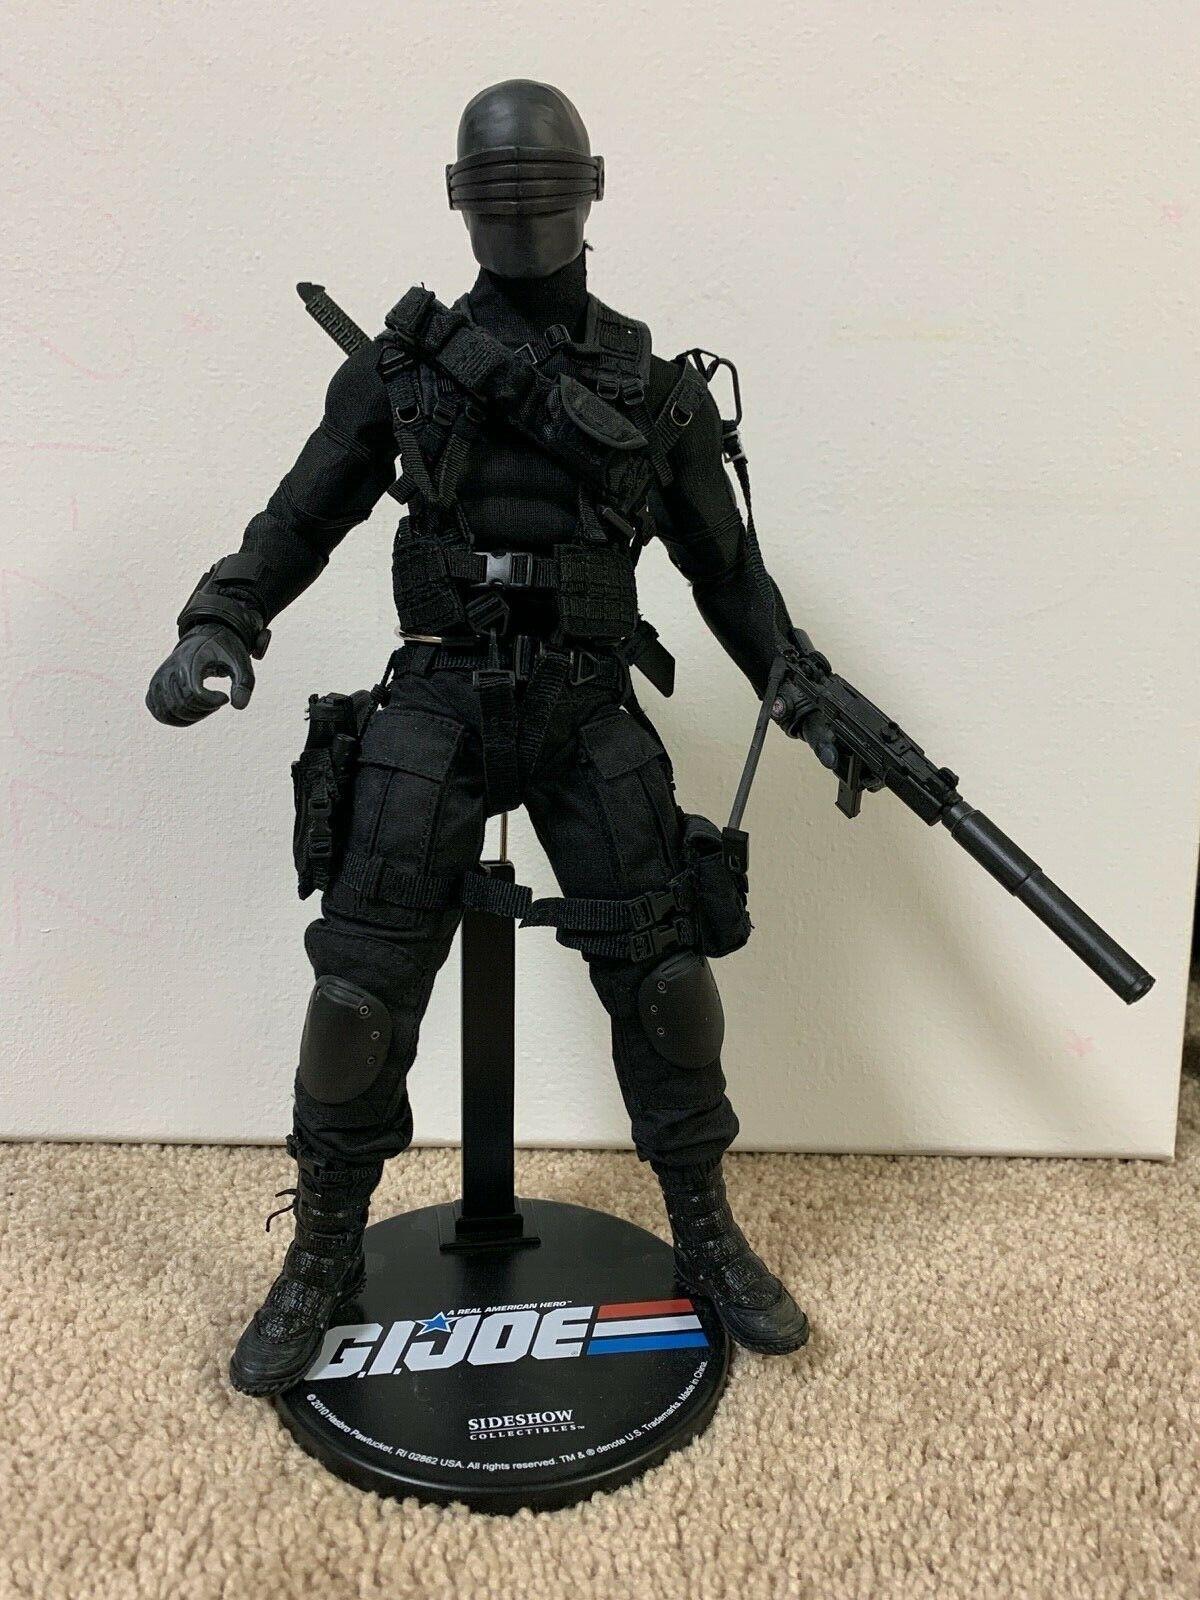 Custom Sideshow Sixth Scale Snake Eyes 1/6 Gi Joe Magneto body w bonus parts on eBay thumbnail